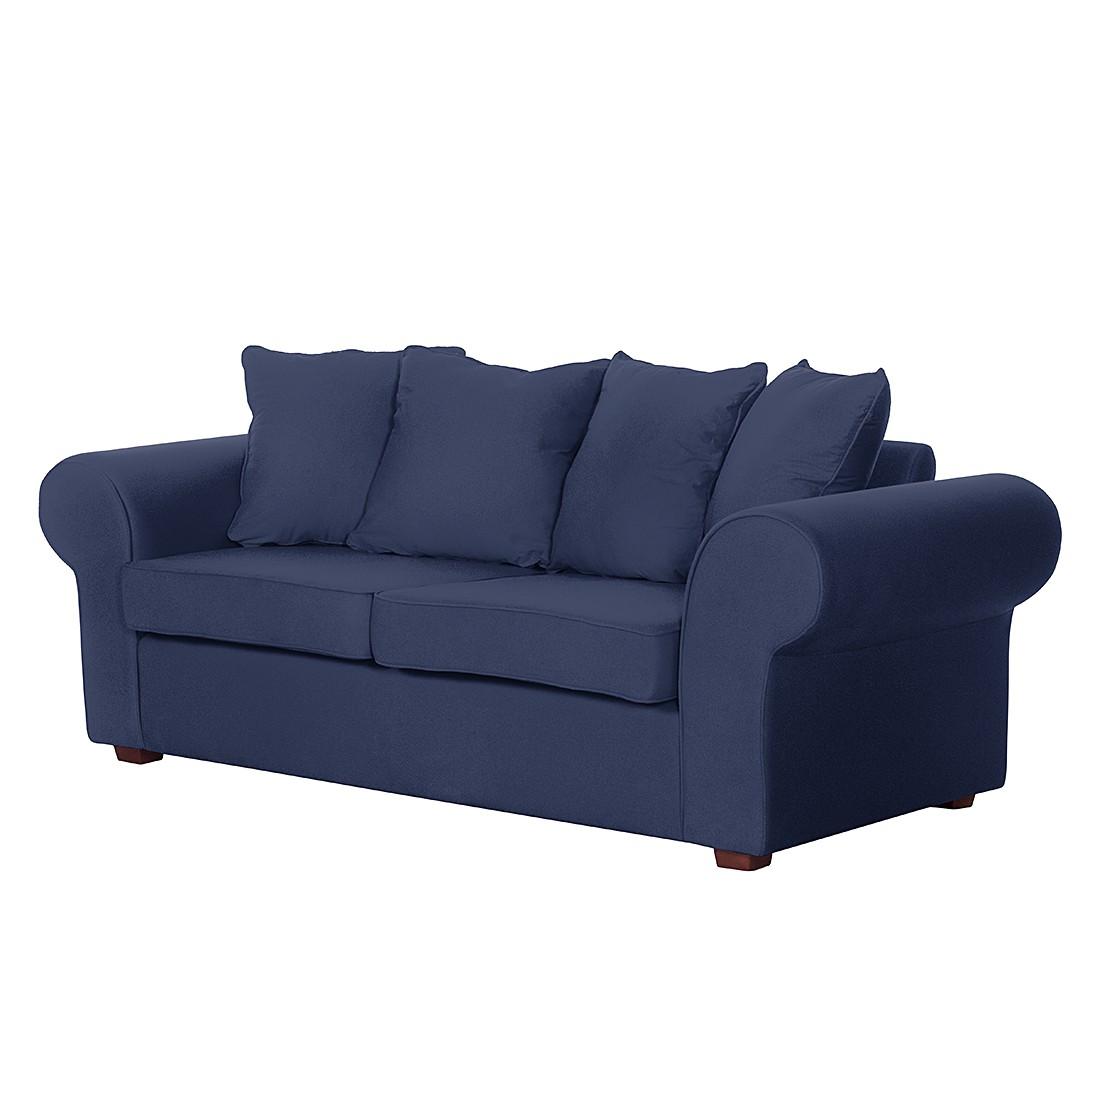 sofas sitzh he 50 preisvergleiche erfahrungsberichte. Black Bedroom Furniture Sets. Home Design Ideas